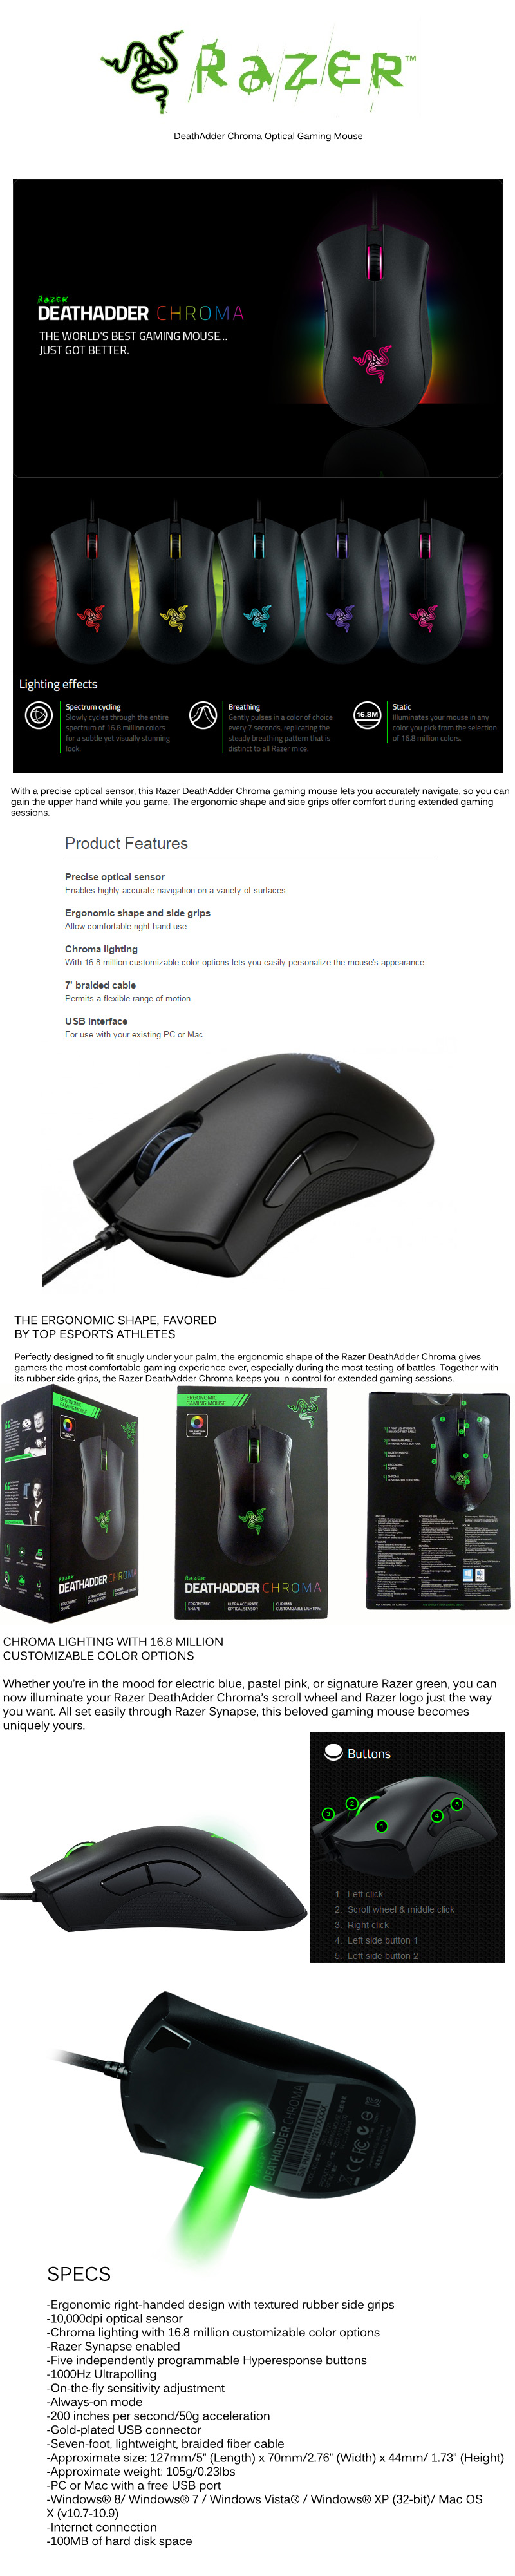 Razer DeathAdder Chroma Optical Gaming Mouse Ergonomic Shape Side Grips  Chroma Lighting Braided Cable 10000dpi Local Stocks 2 Years Razer Warranty